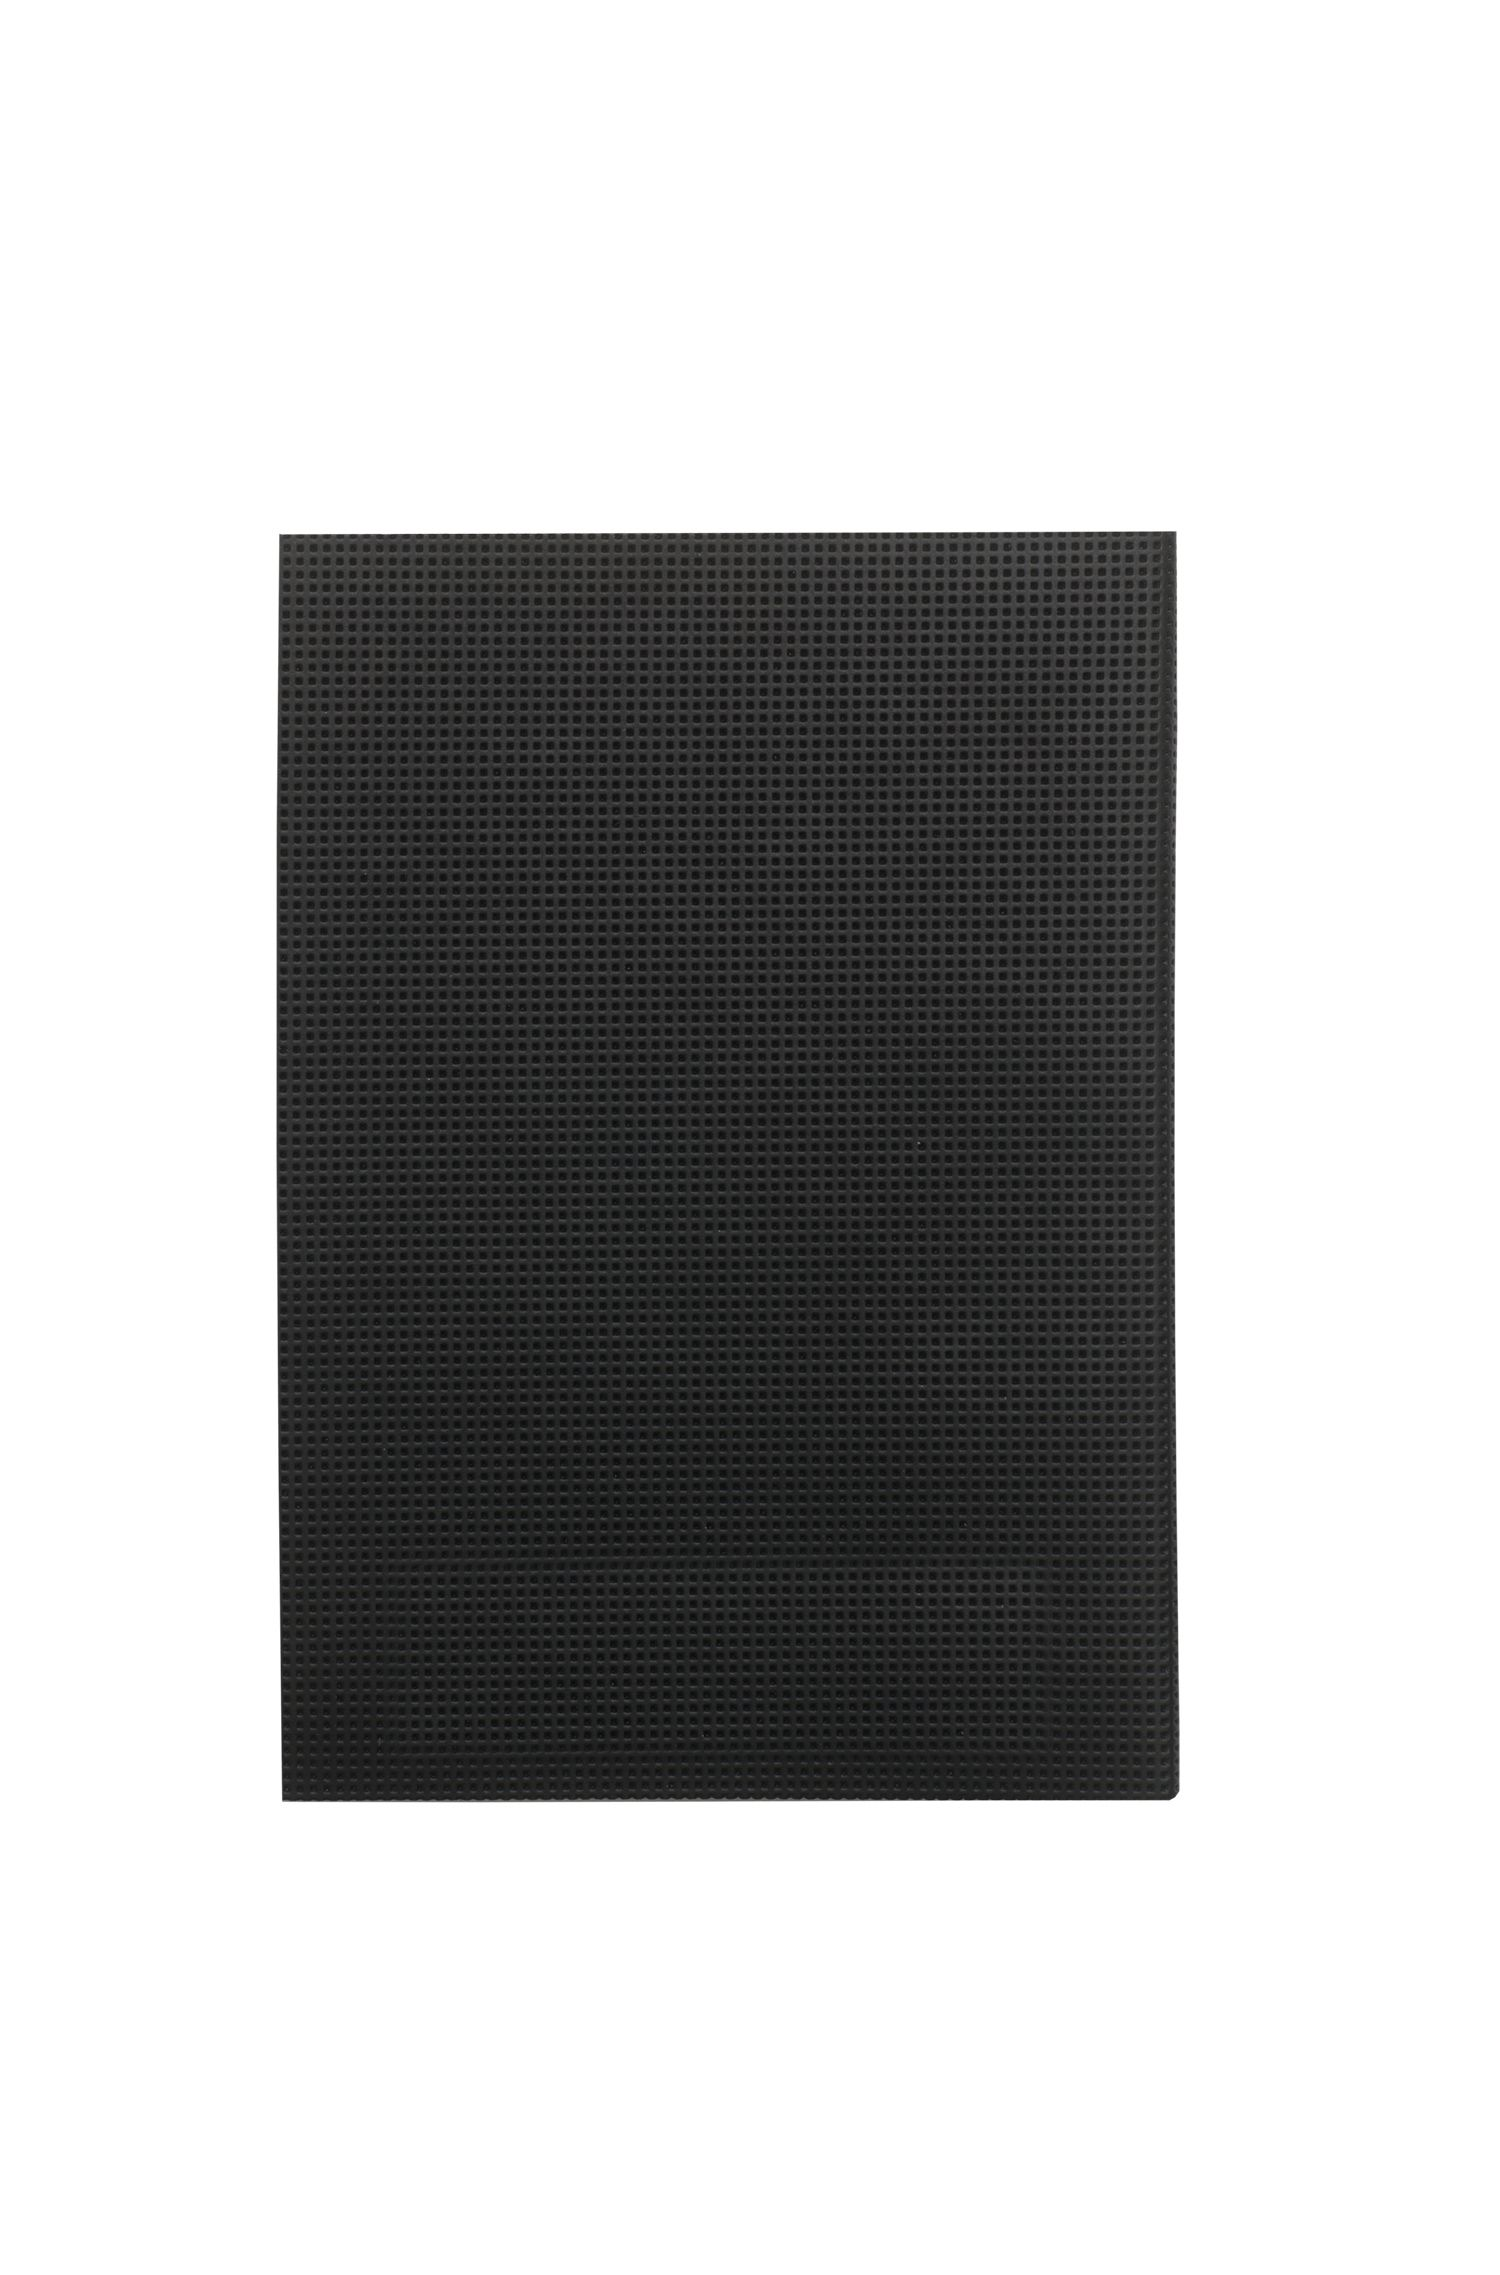 A6-notitieboek: 'Grid Soft'